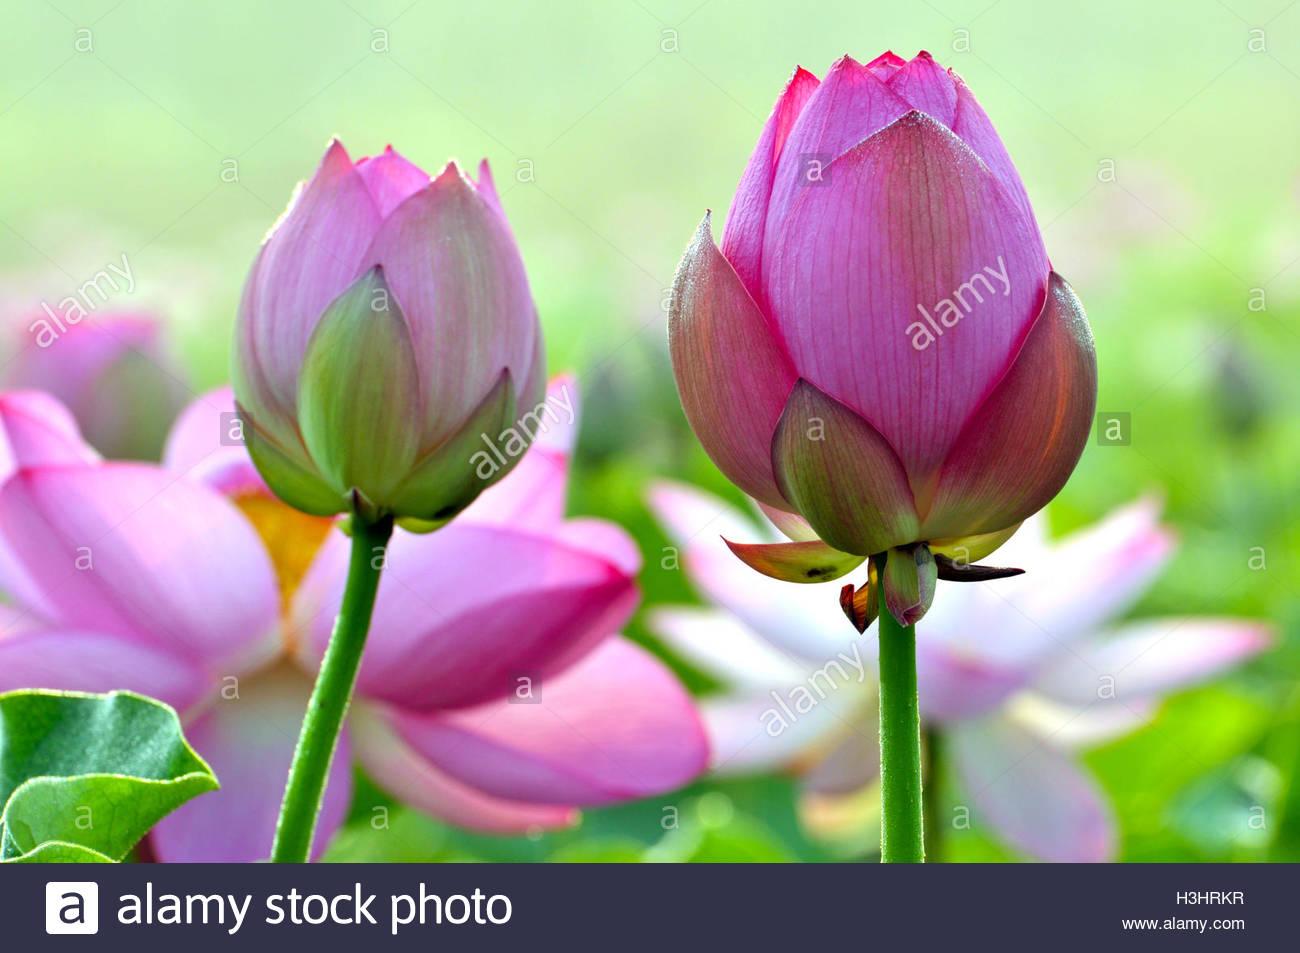 Lotus Flower Hindu Imgenes De Stock Lotus Flower Hindu Fotos De